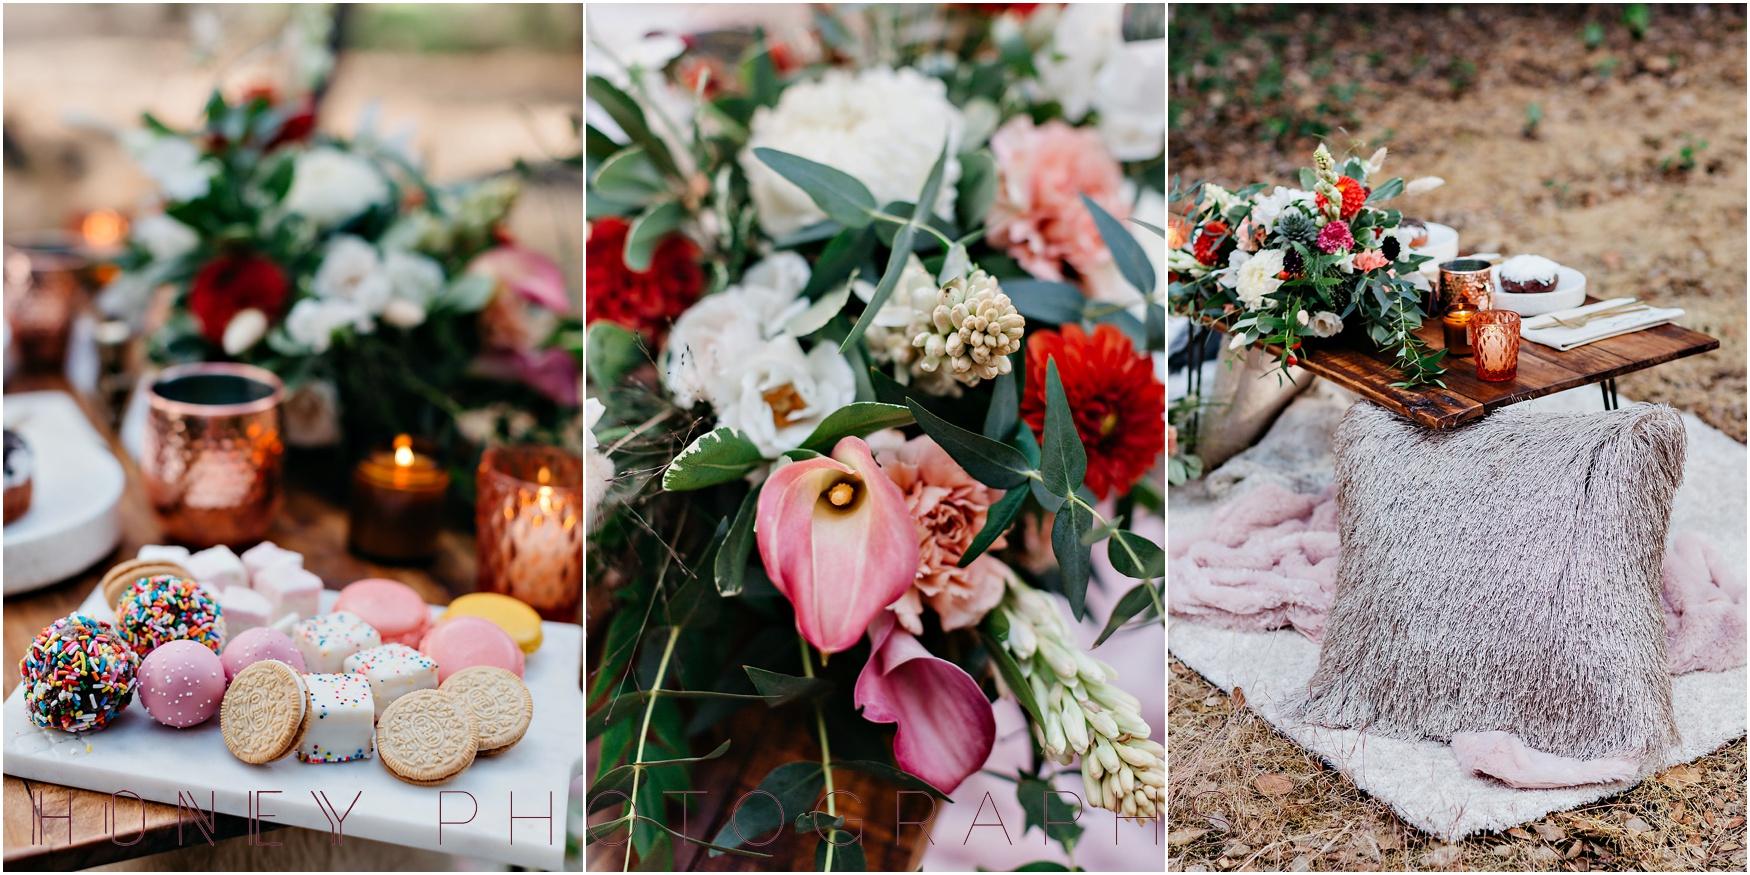 picnic-wedding-rustic-sweetheart-table-felicita-park-boho05.jpg